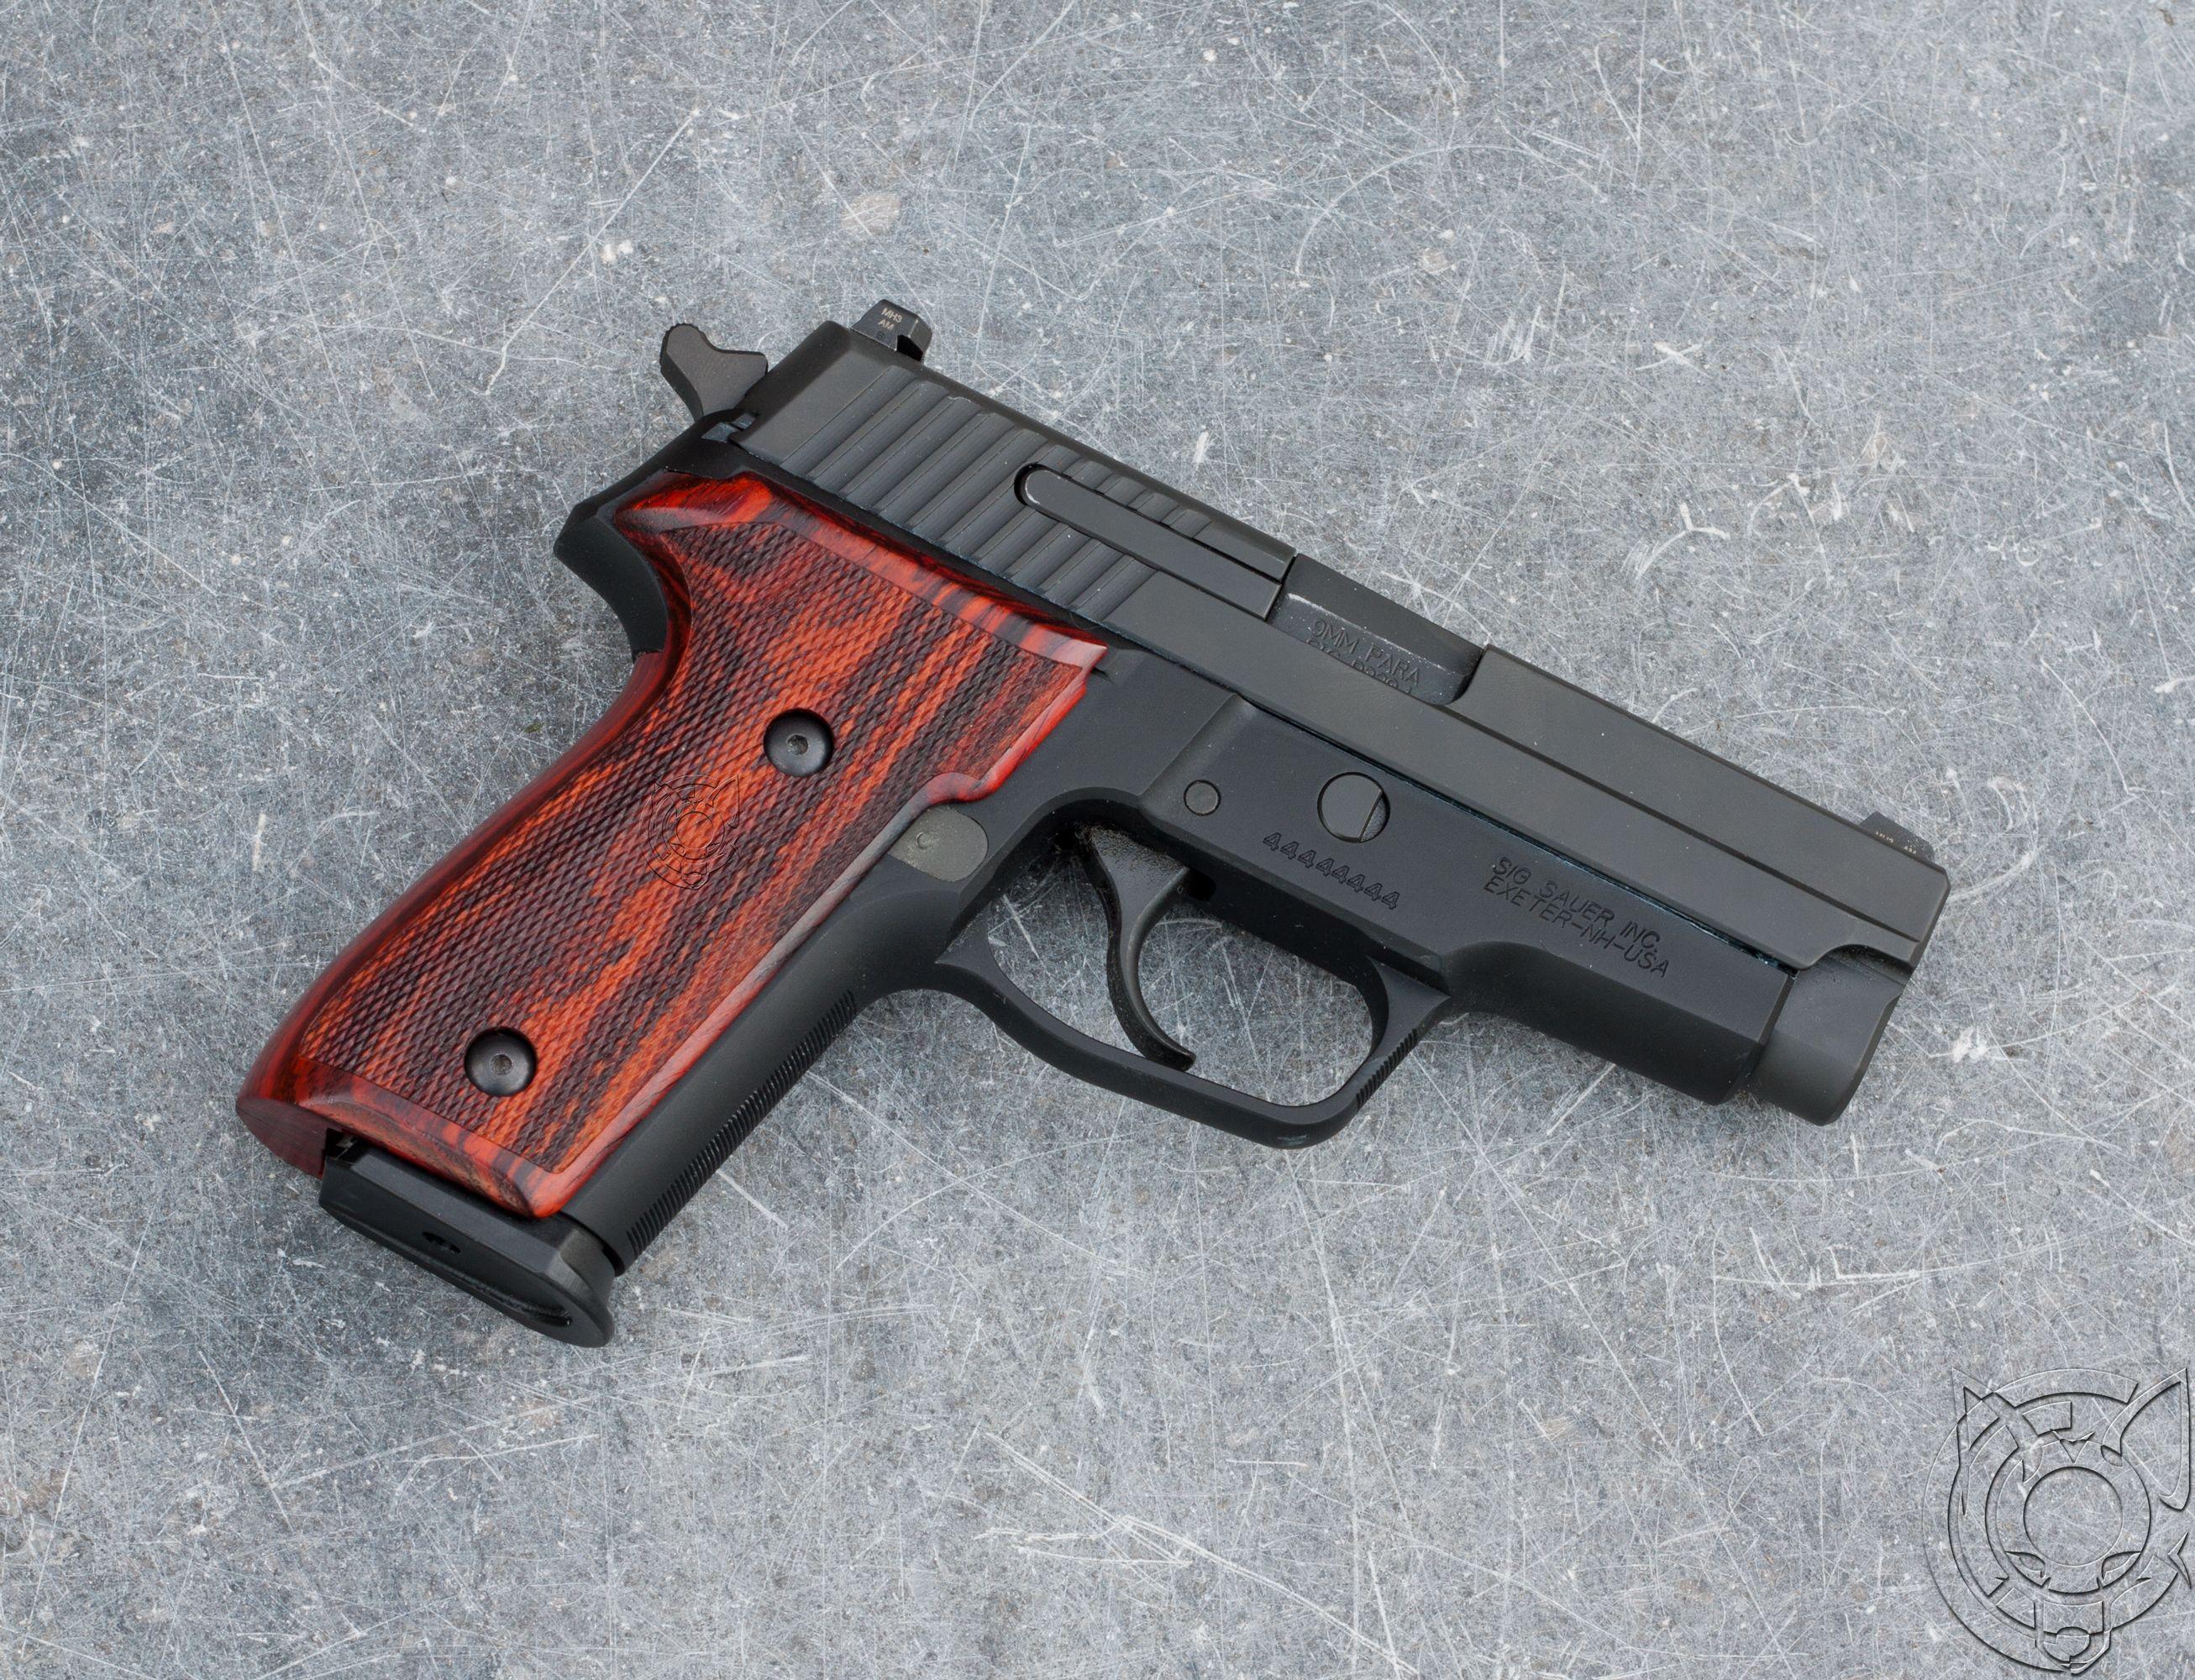 Sig sauer m11 a1 cocobolo wood grips [2614x2000][oc] firearm